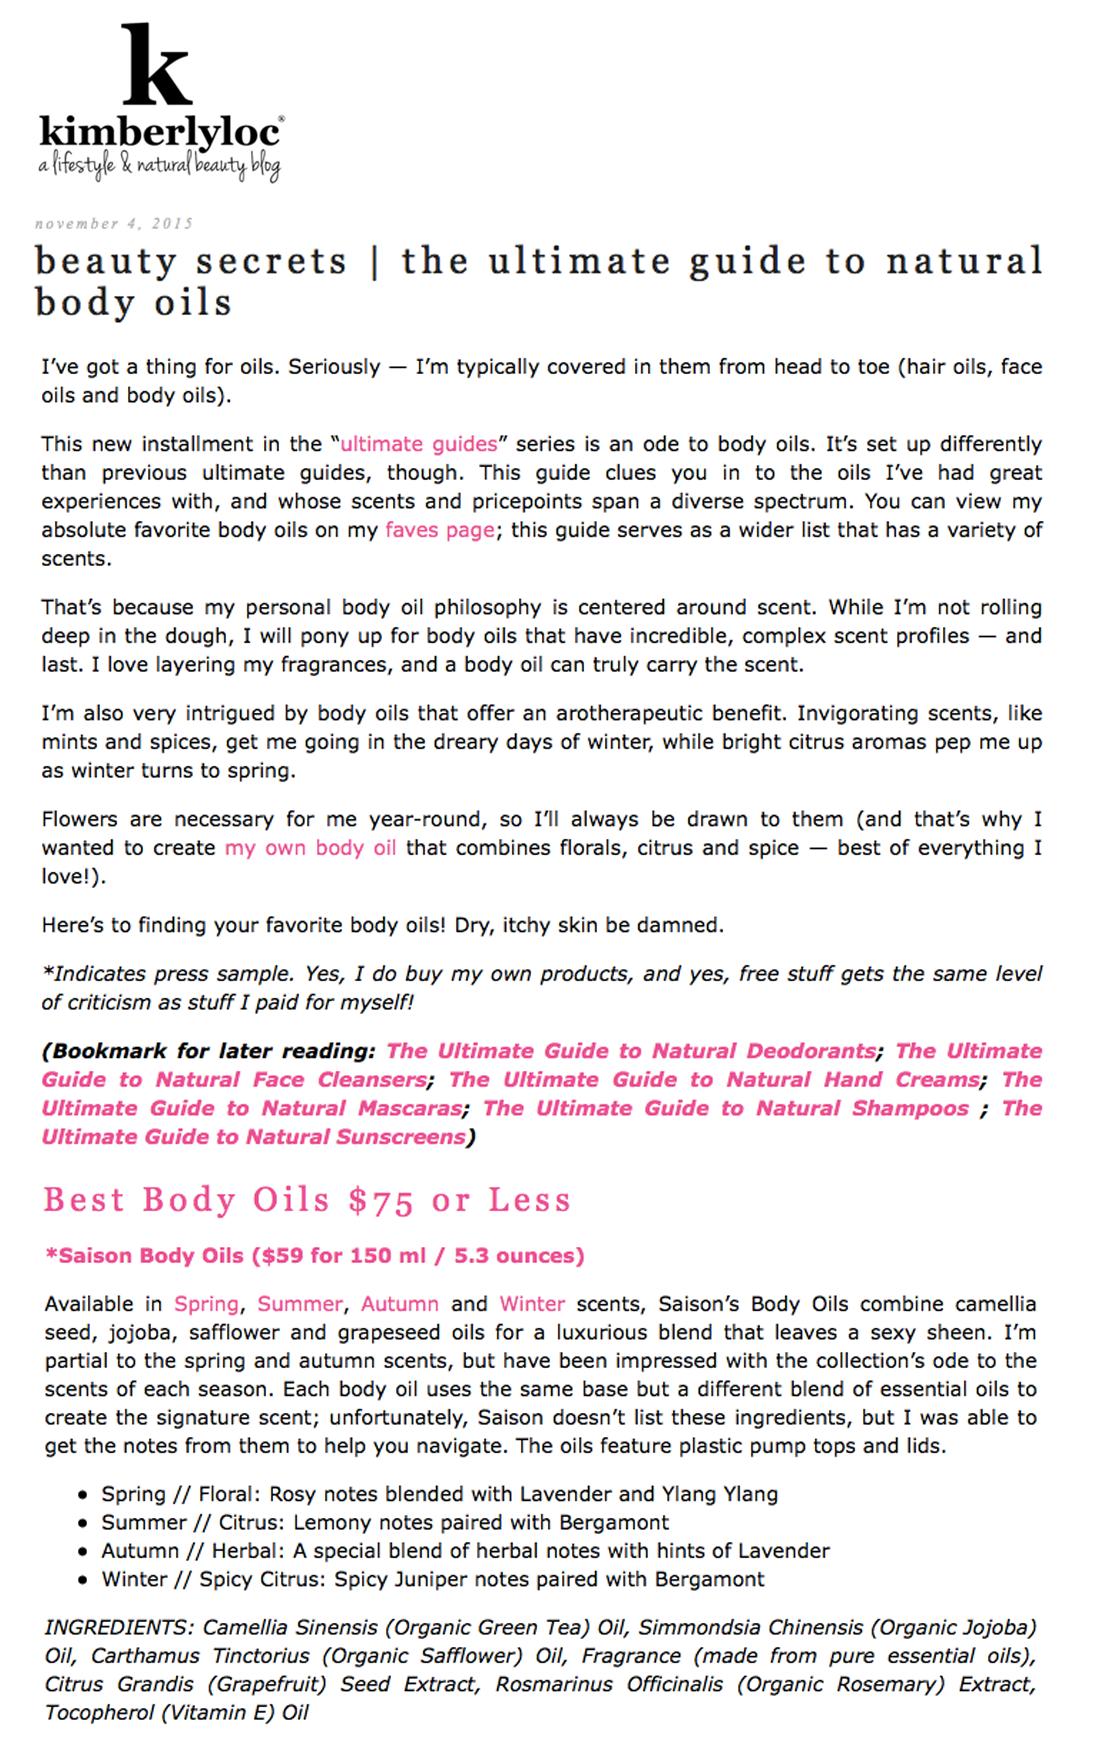 Saison Body Oils In Kimberly Loc Blog